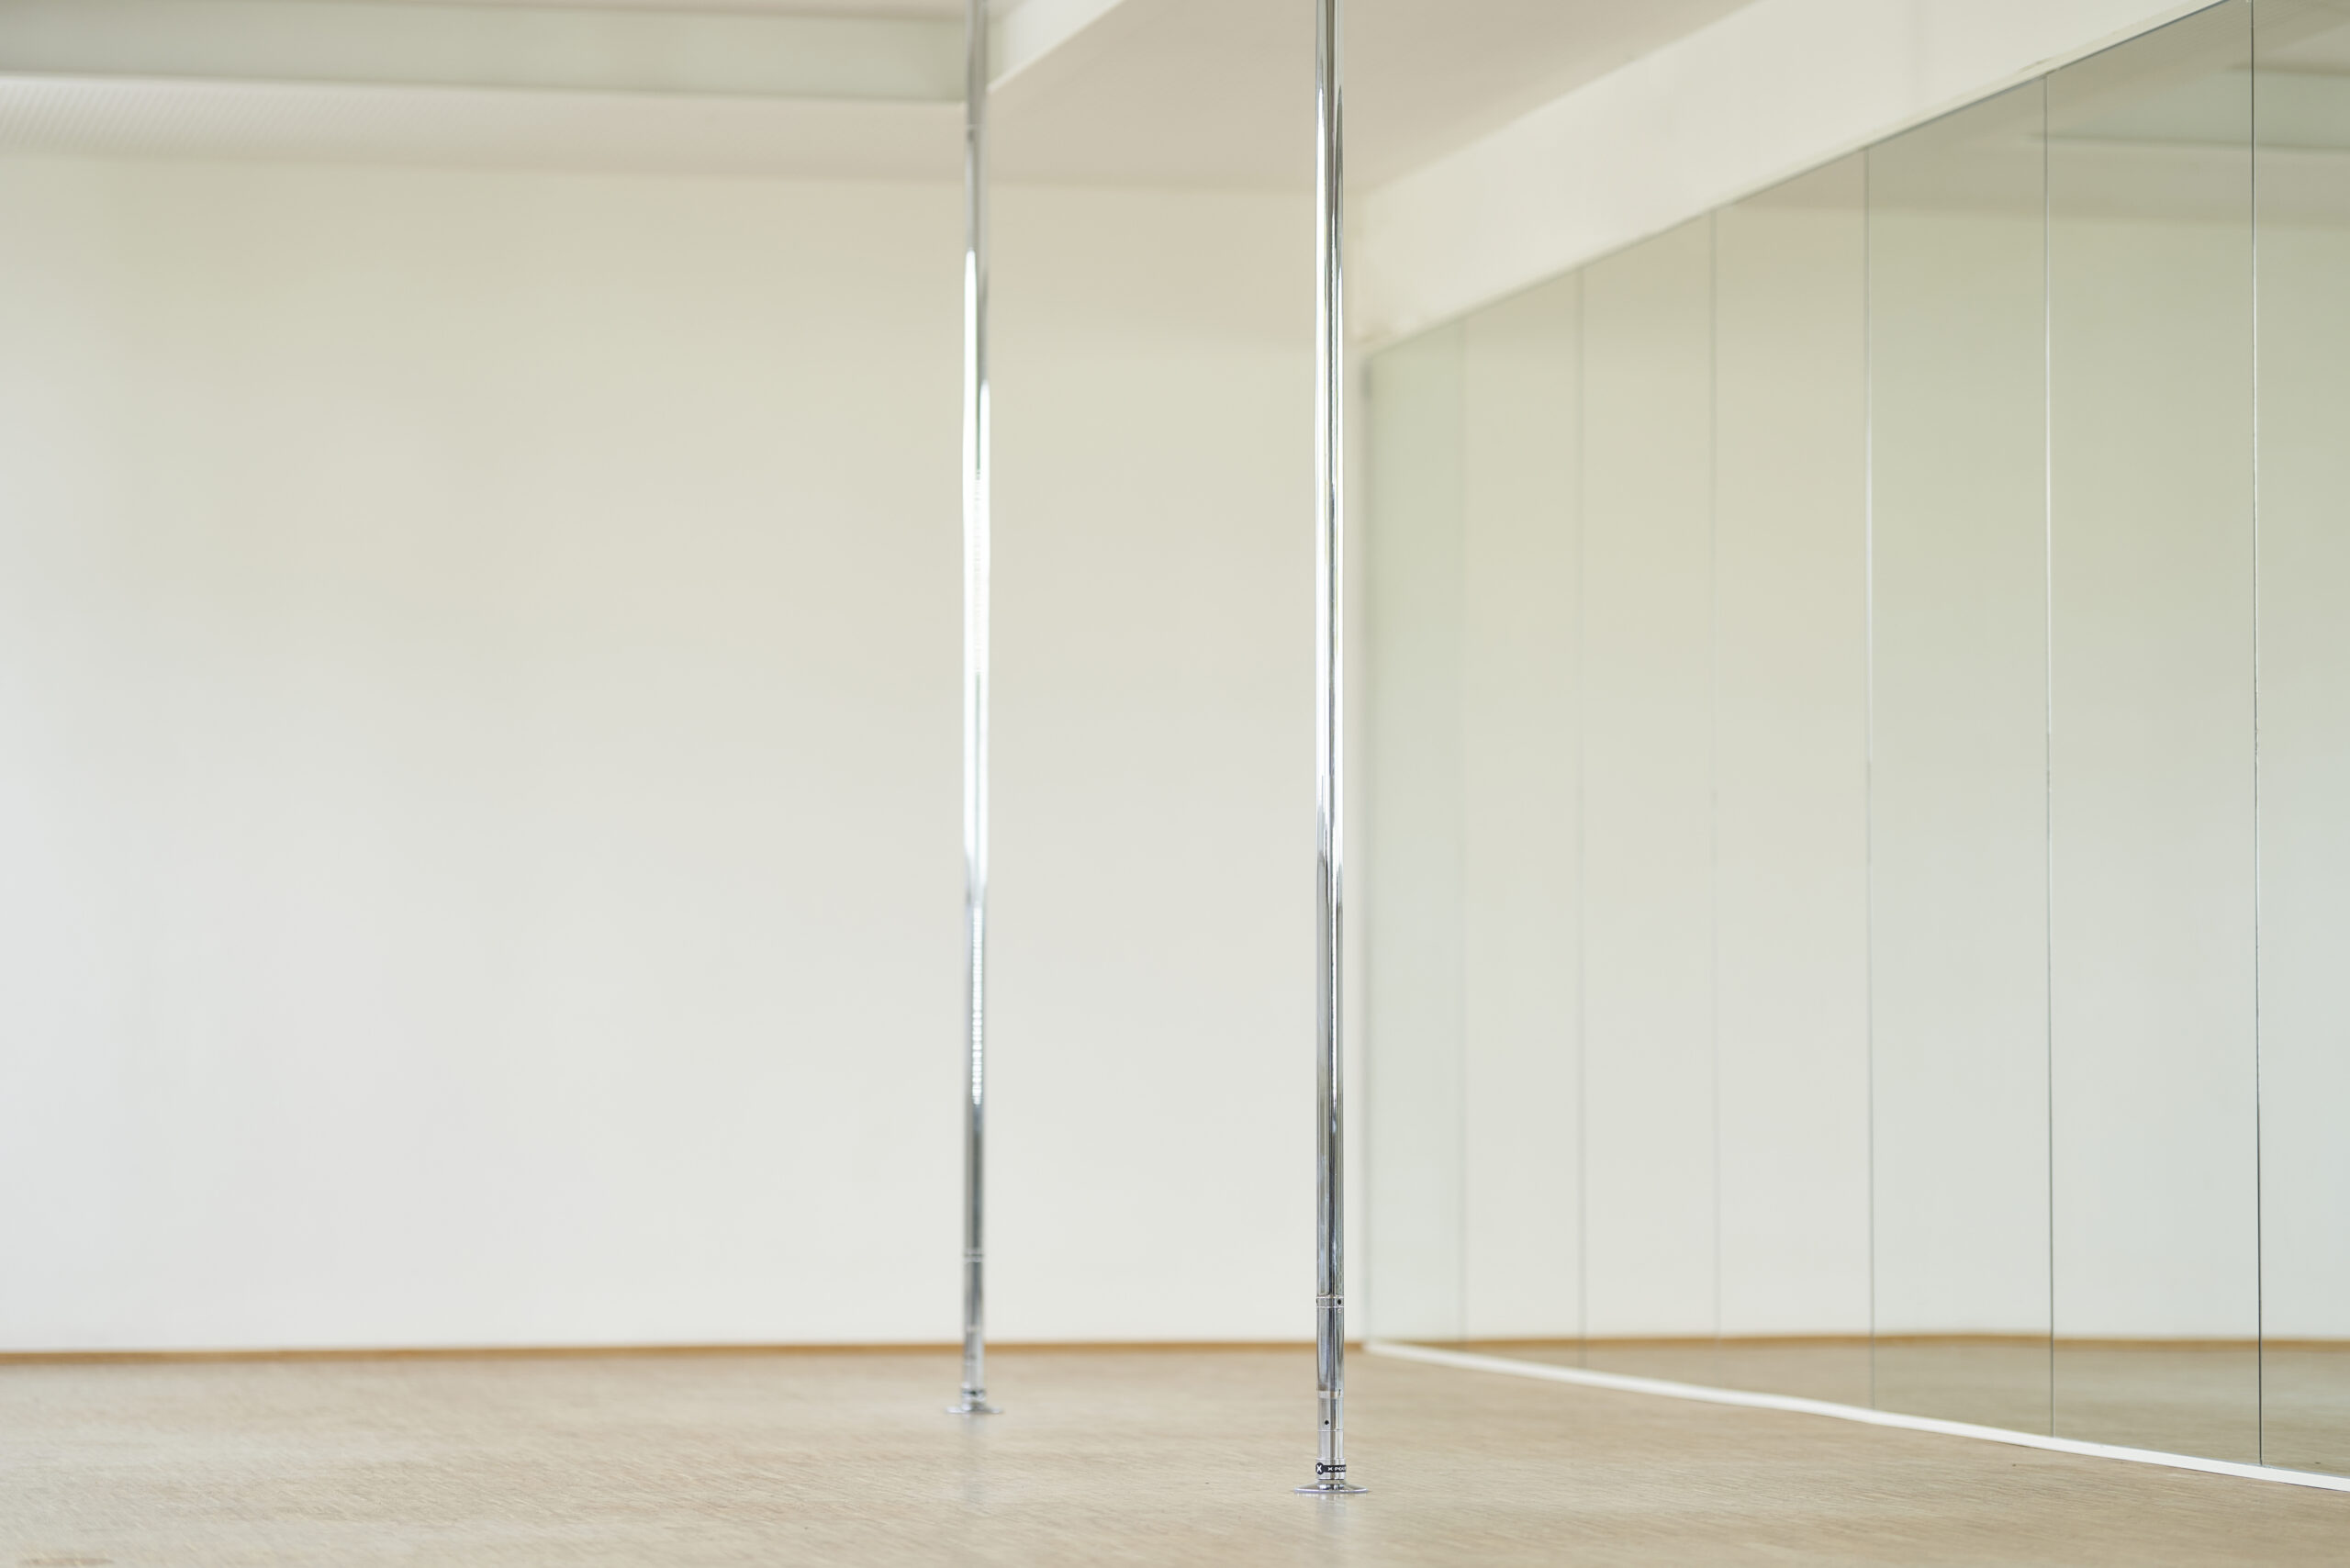 munich-poledance-studio-01